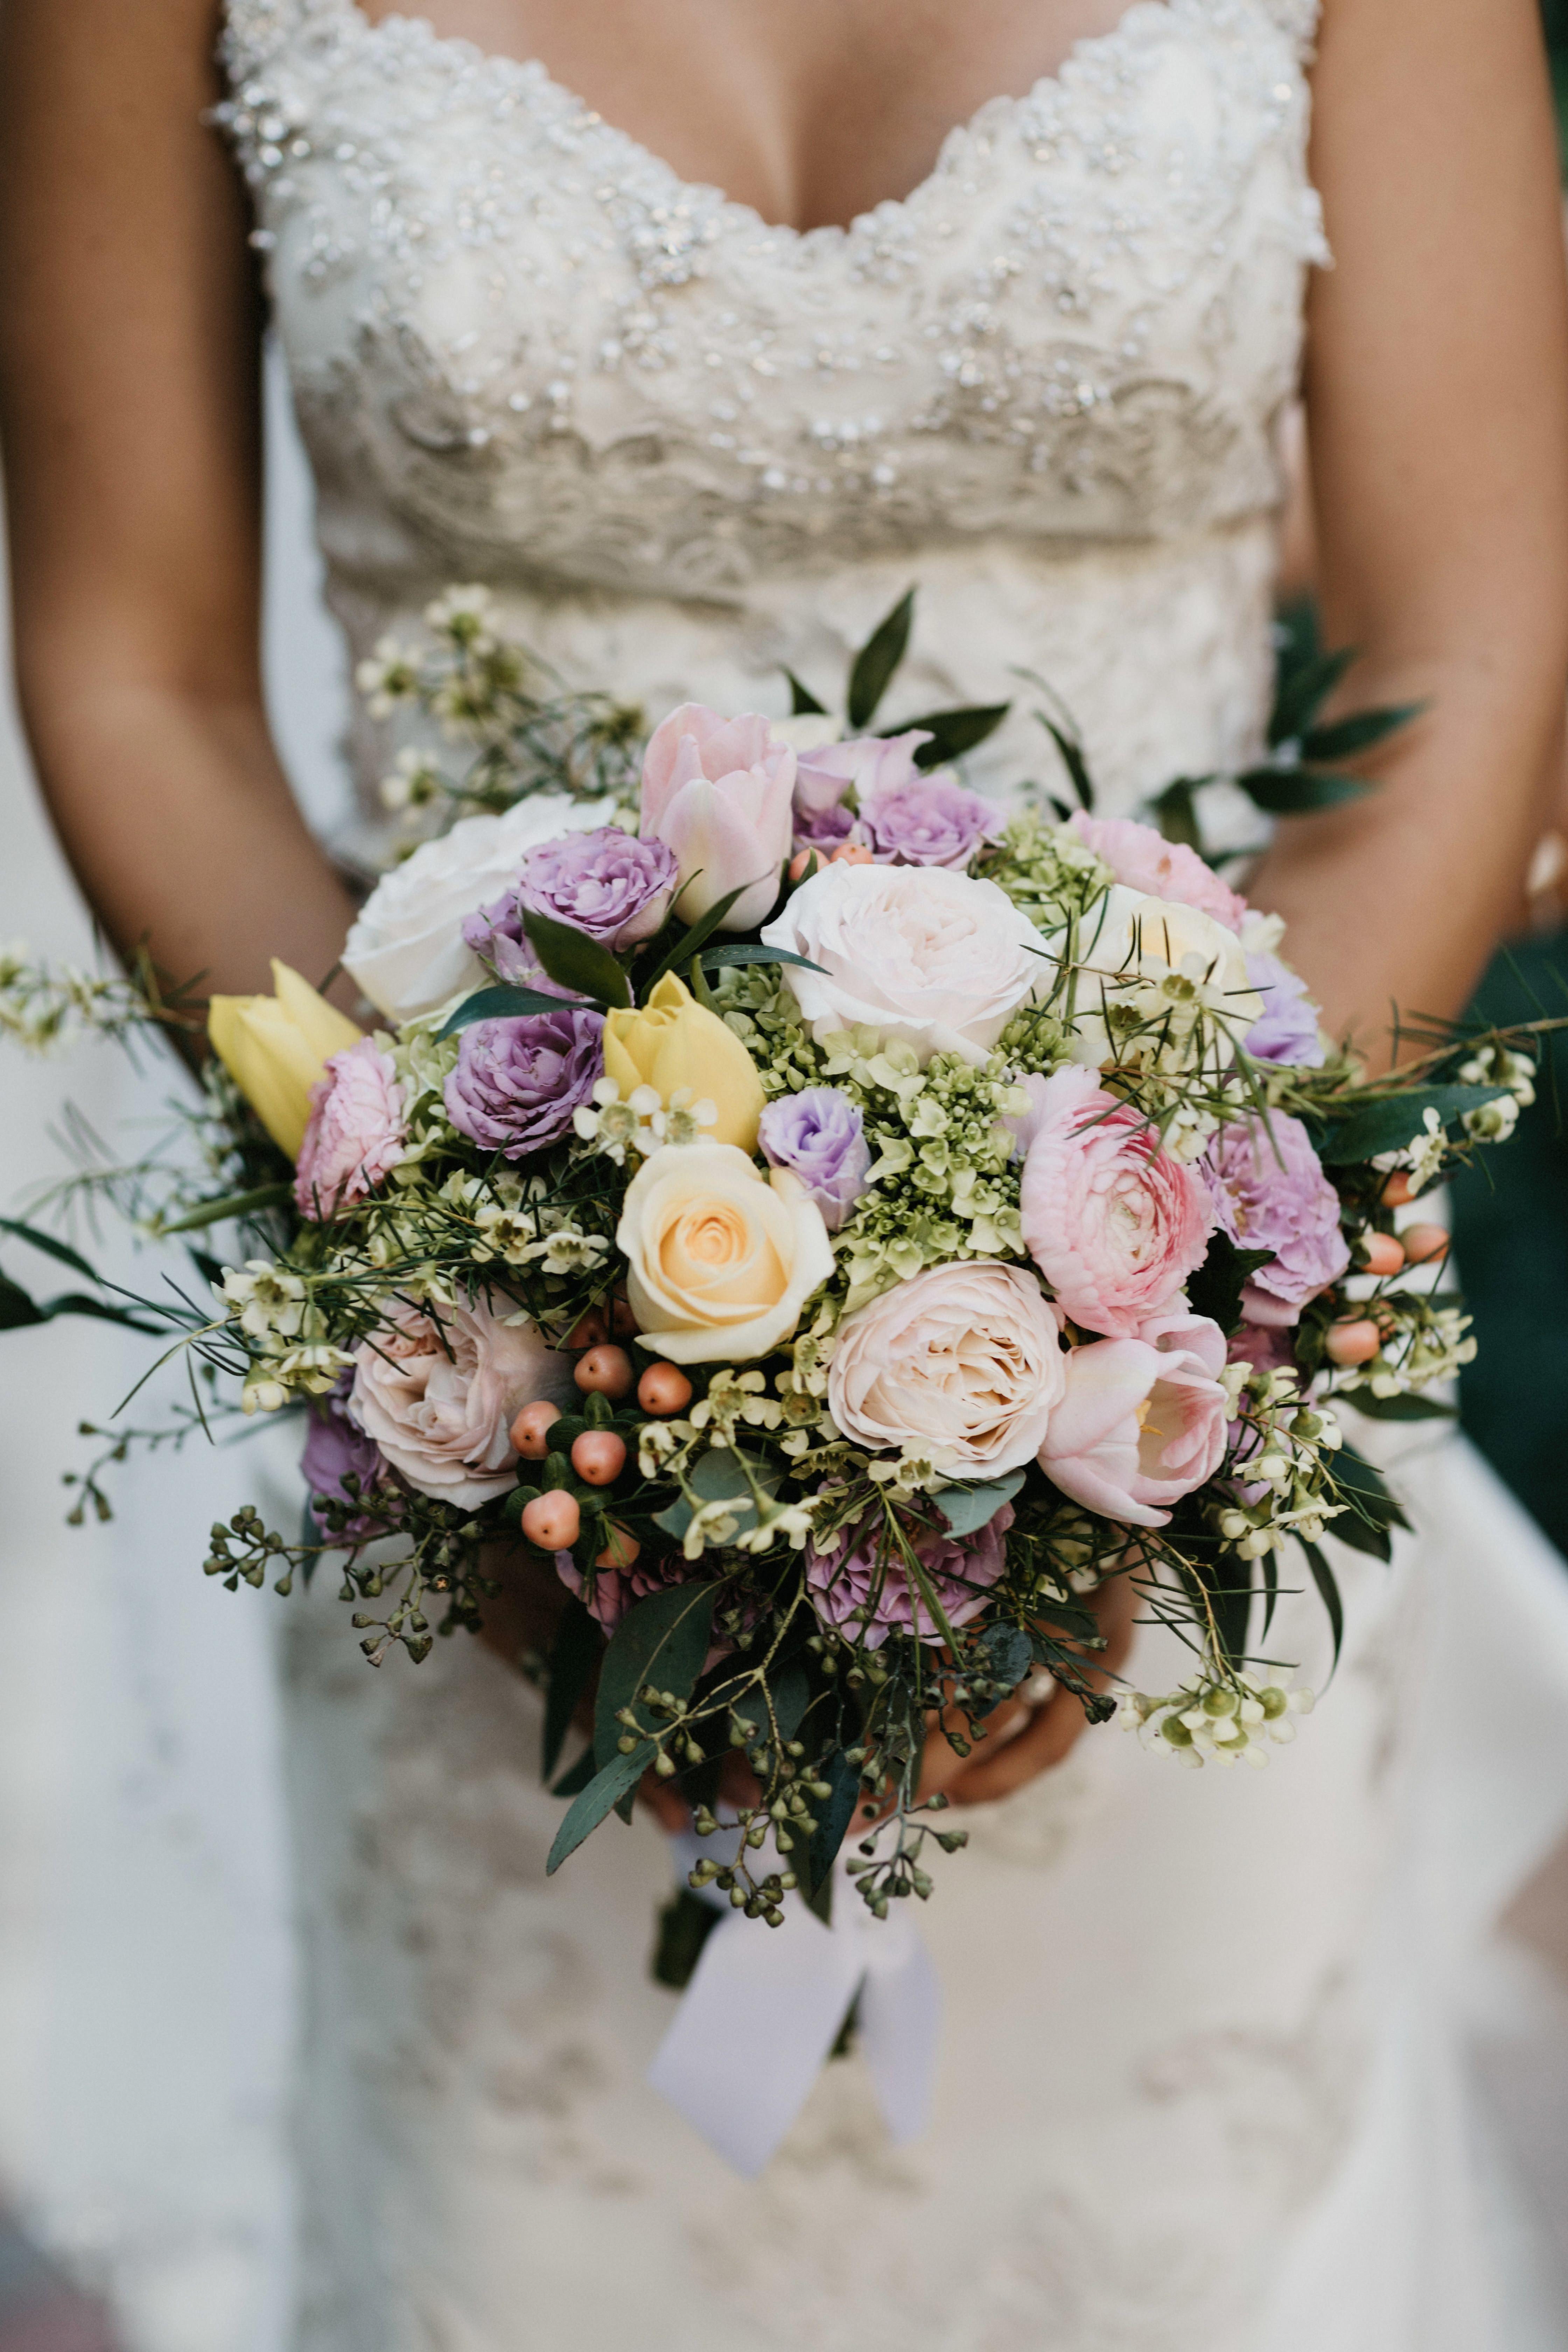 Elegant brides bouquet elegant bride bride bouquets